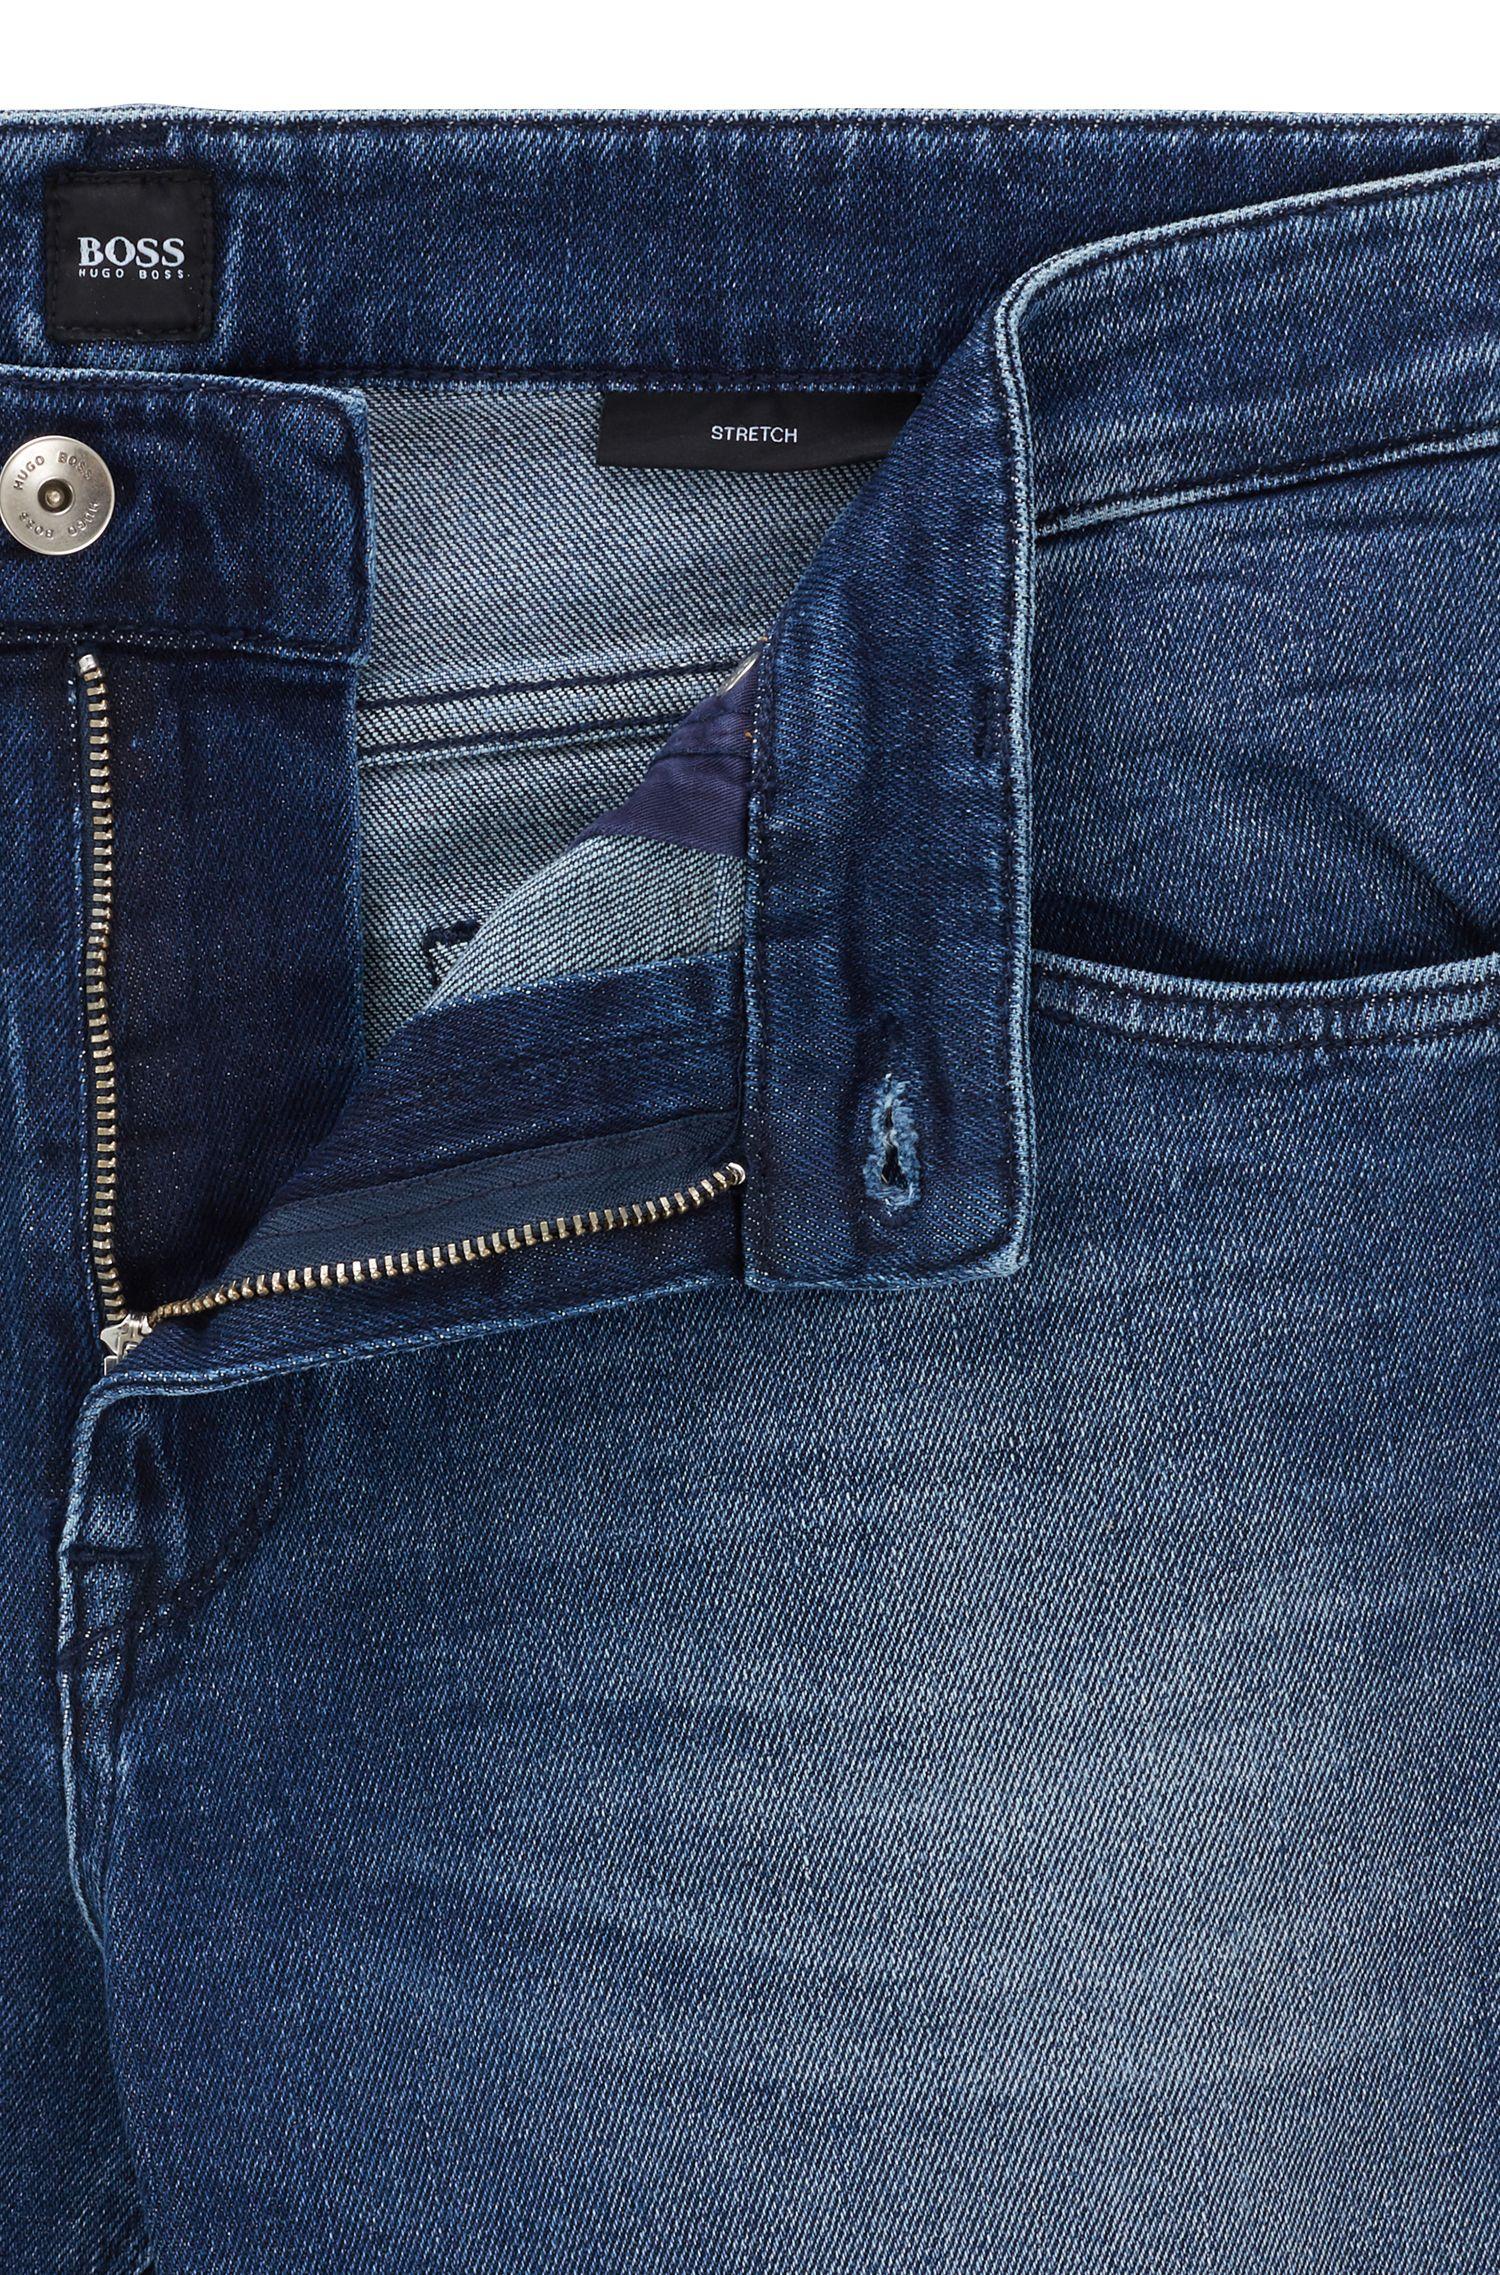 Regular-fit jeans in dark-blue comfort-stretch denim, Blue